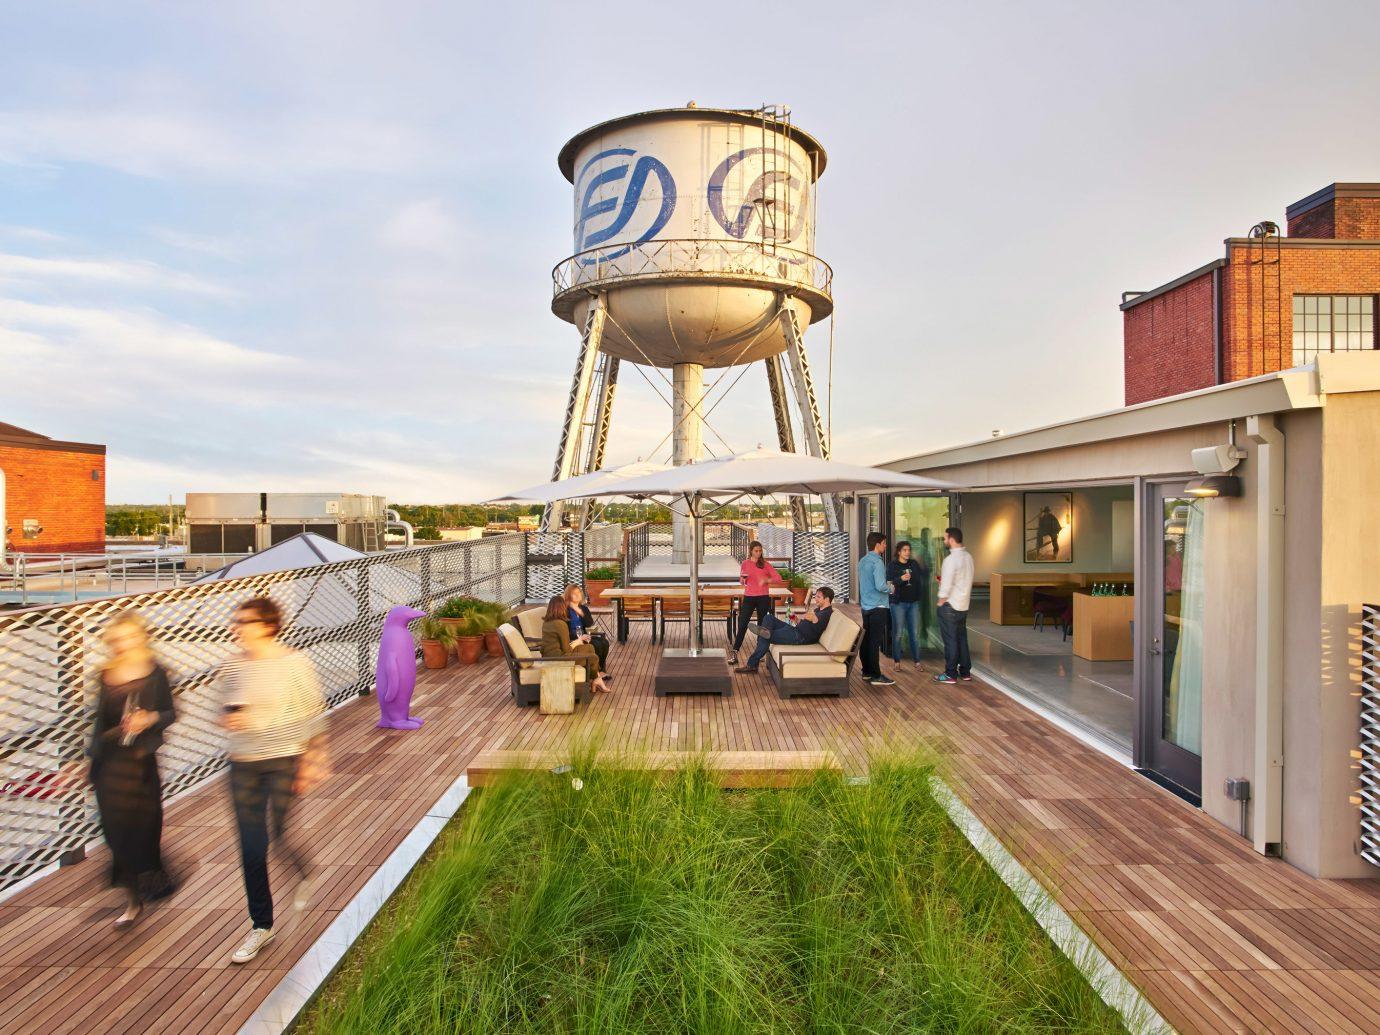 Hotels sky outdoor leisure Resort amusement park vacation walkway park estate boardwalk